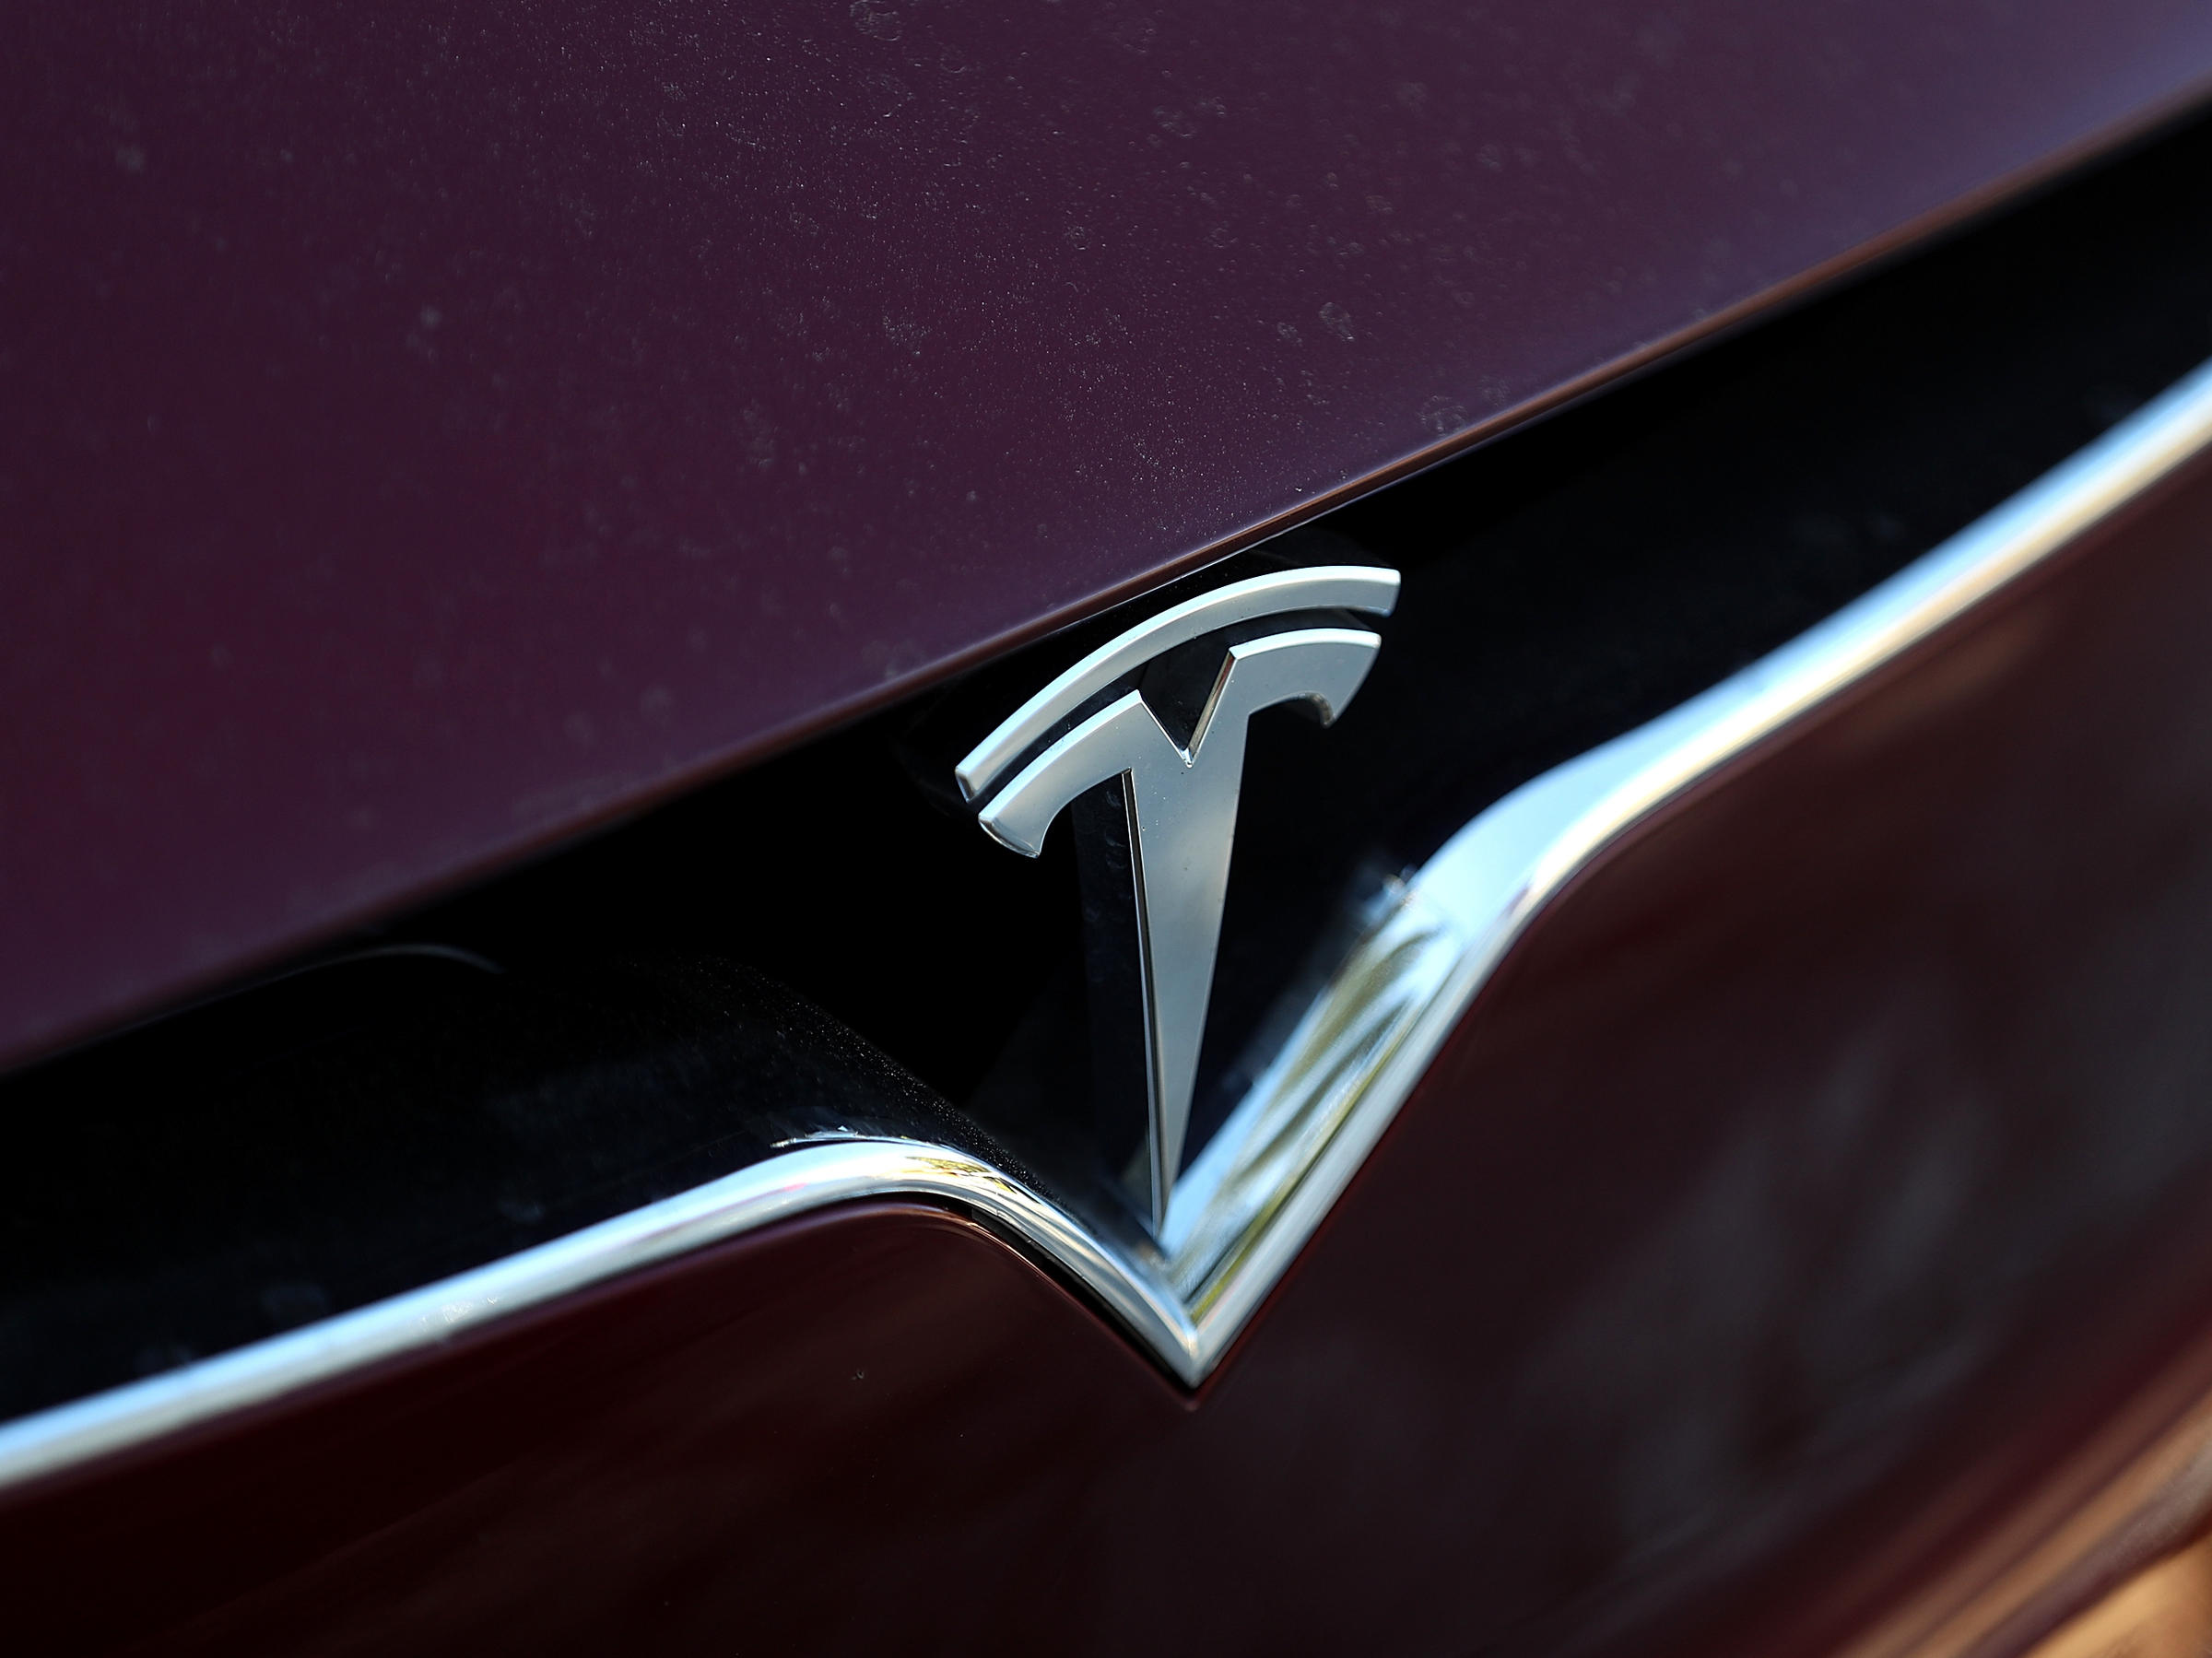 NTSB: Tesla Autopilot, Distracted Driver Caused Fatal Crash